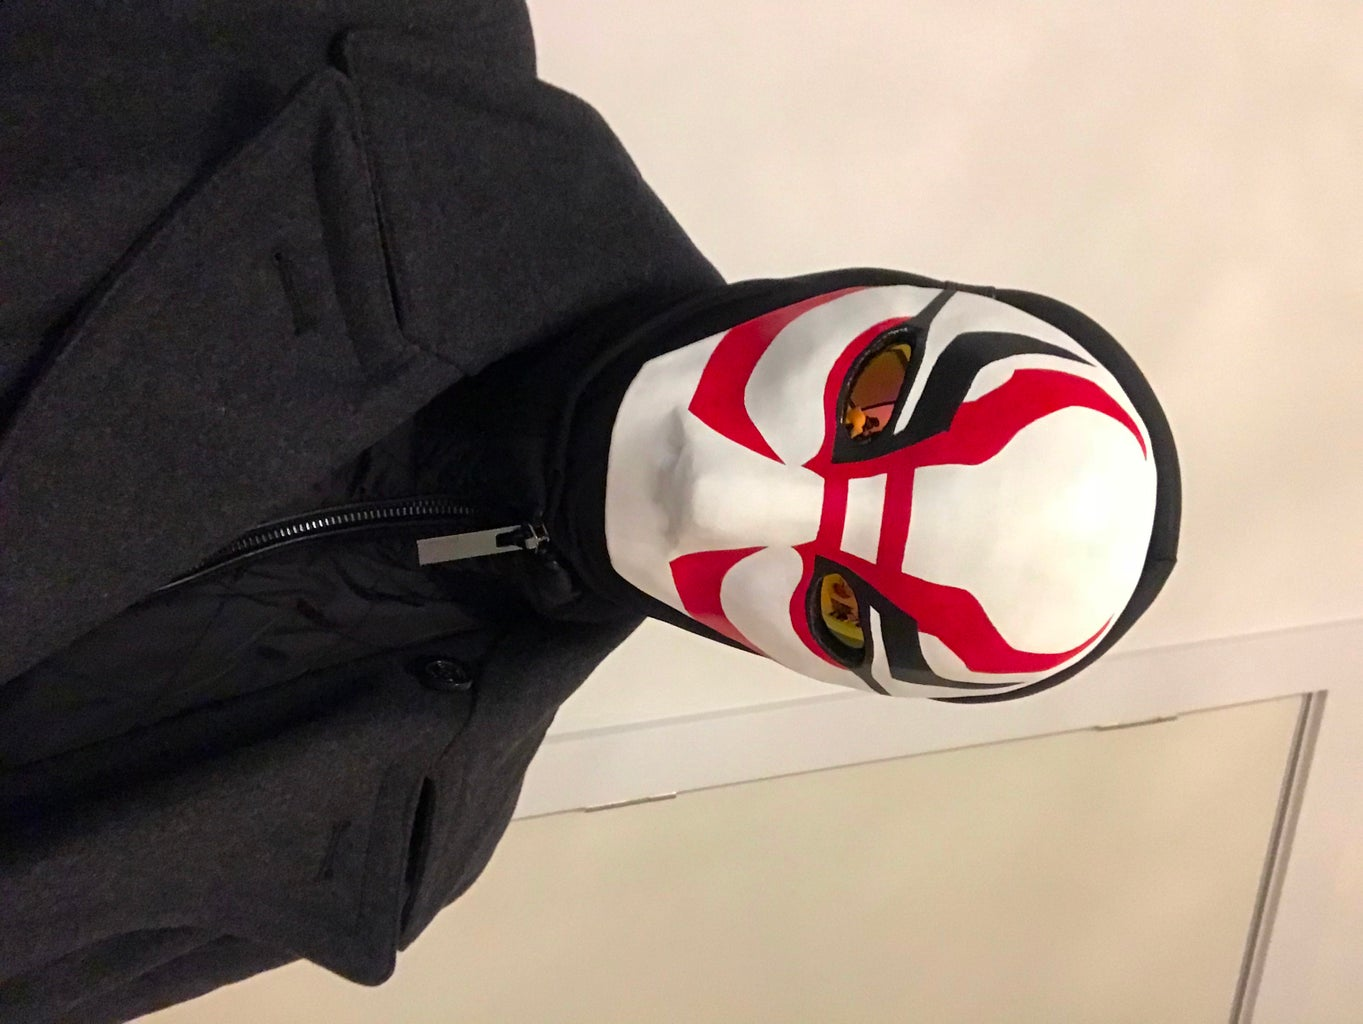 How to Make Yokai's Mask From Big Hero 6